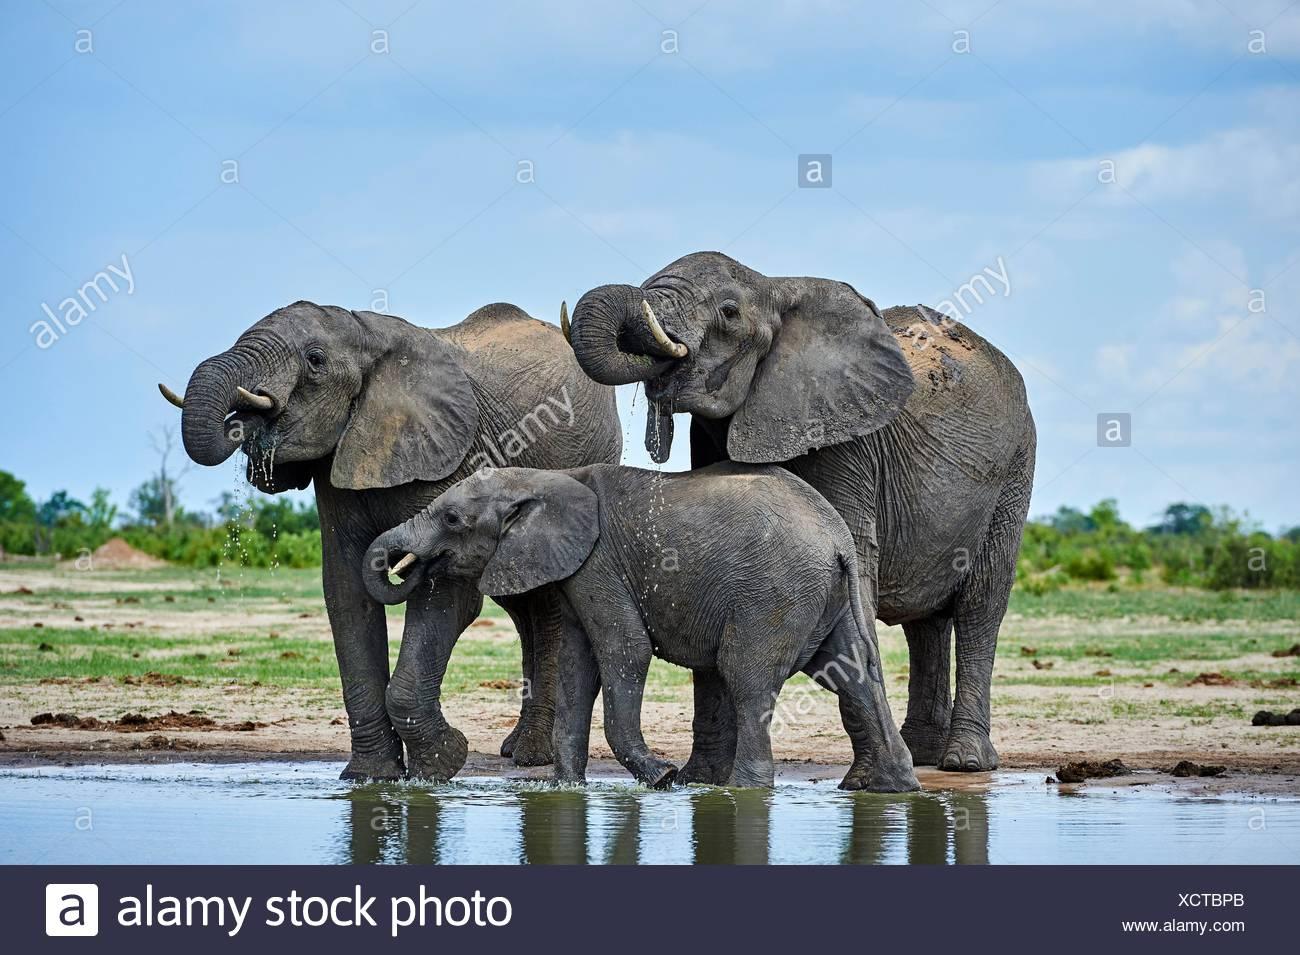 Elefante africano (Loxodonta africana) bere a watehole. Parco Nazionale di Hwange, Zimbabwe. Immagini Stock